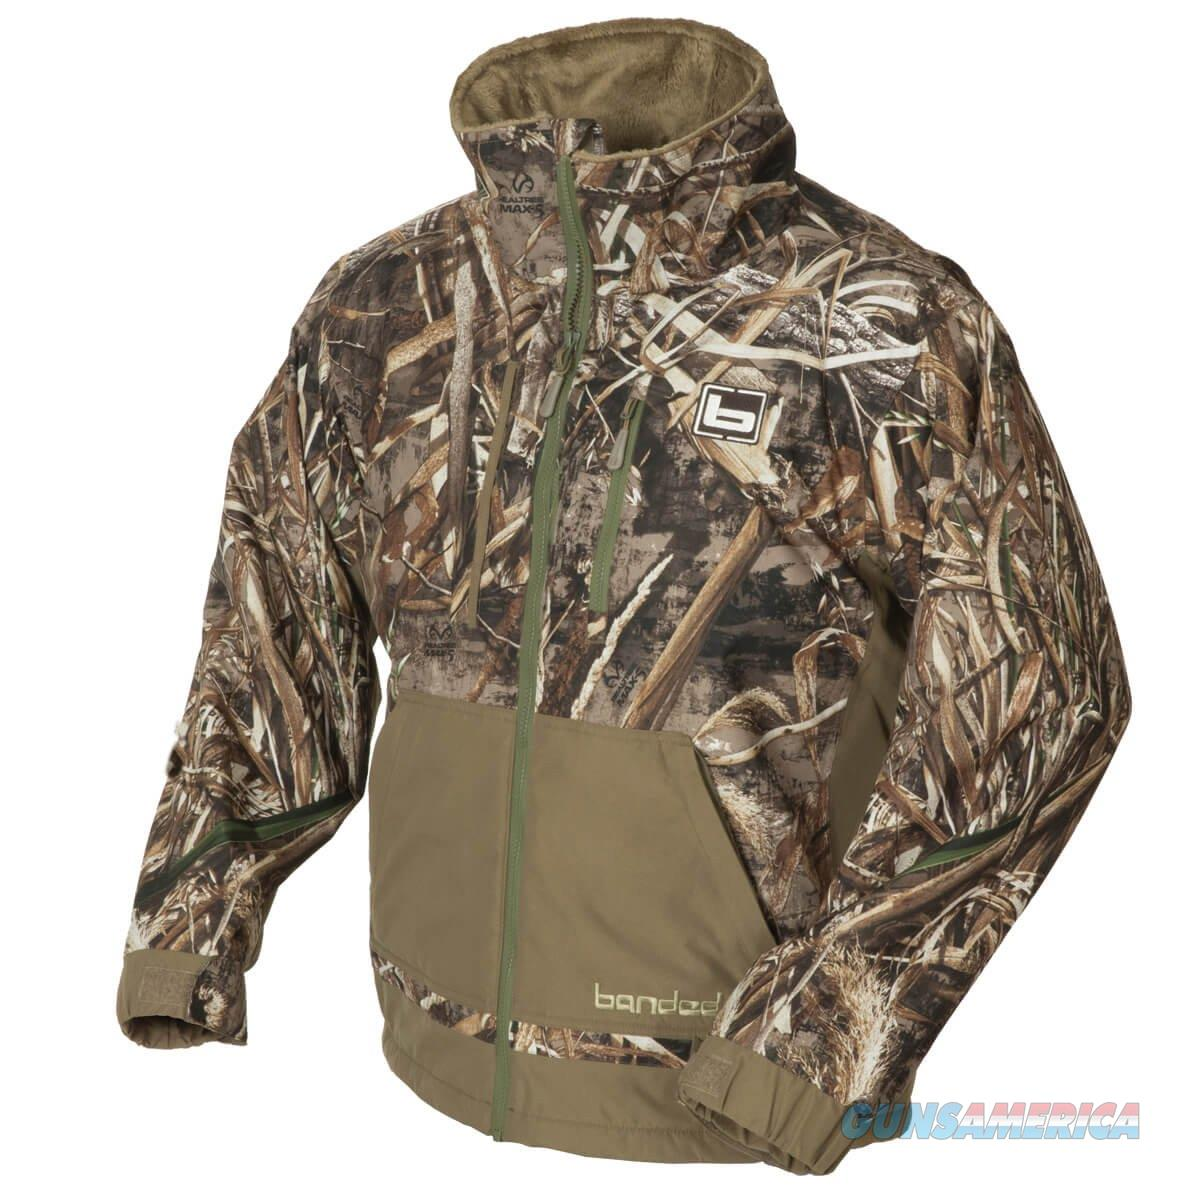 Banded Chesapeake Pullover Max 5 2XL  Non-Guns > Shotgun Sports > Vests/Jackets